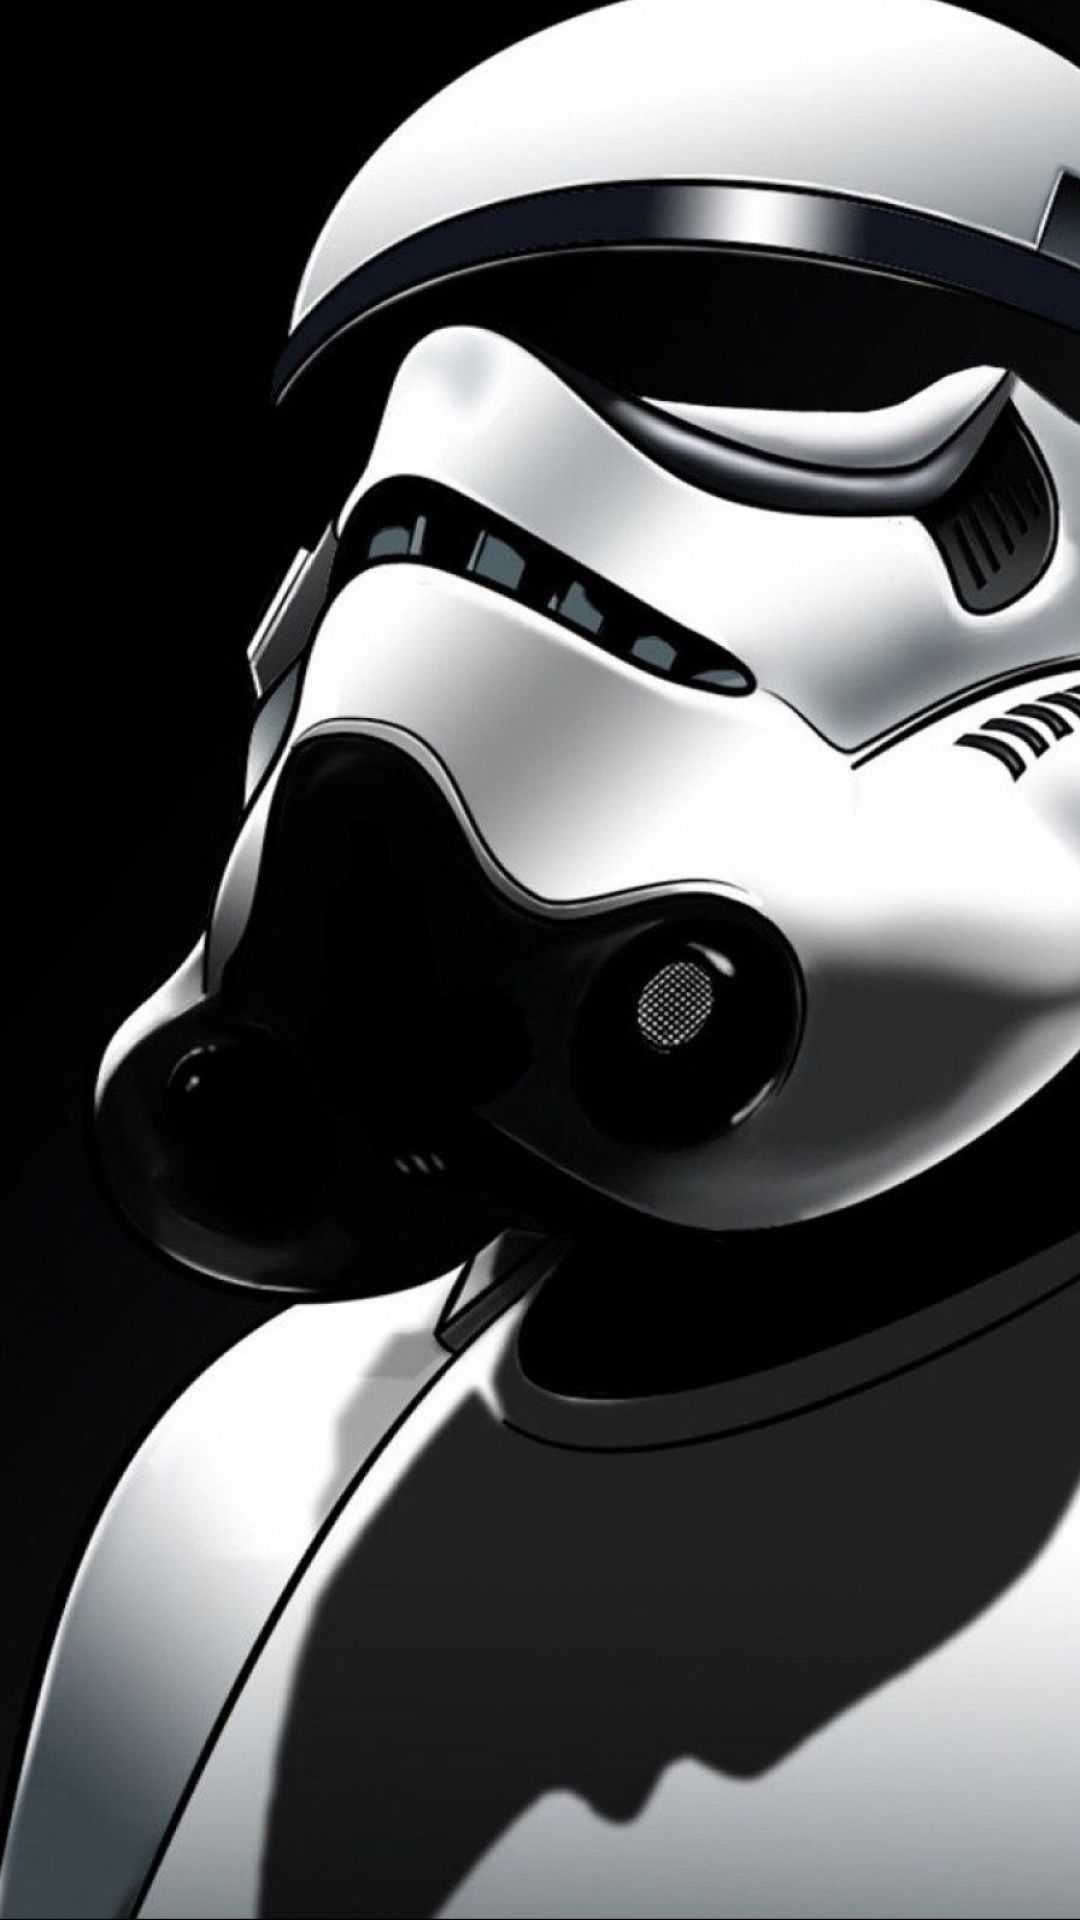 40 Star Wars iPhone 7 Plus Wallpapers   Download at WallpaperBro 1080x1920